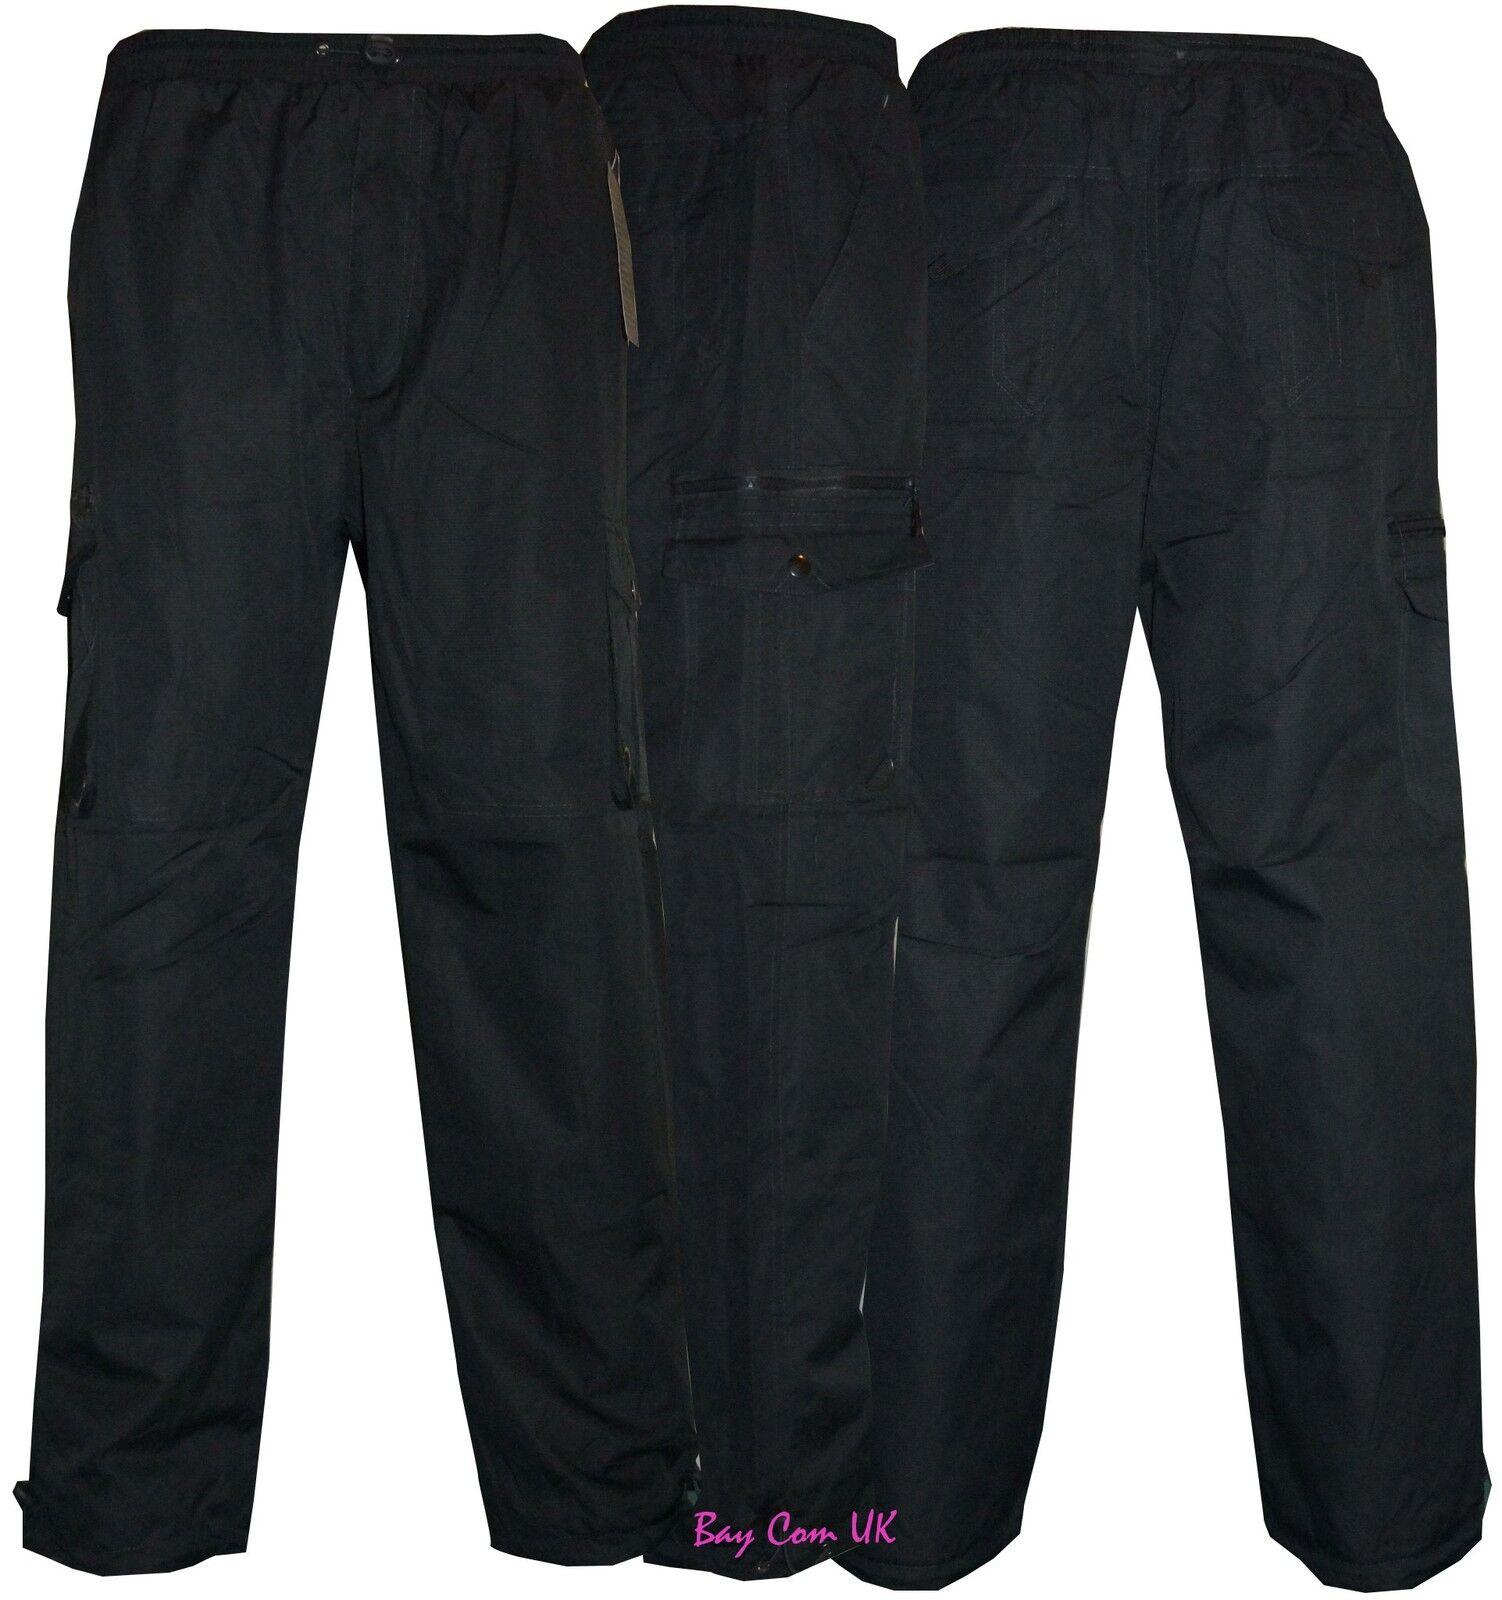 a55d8fdd9fb01 Mens Elasticated Fleece Lined Thermal CargoCombat Trousers Pants Fishing  Hunting